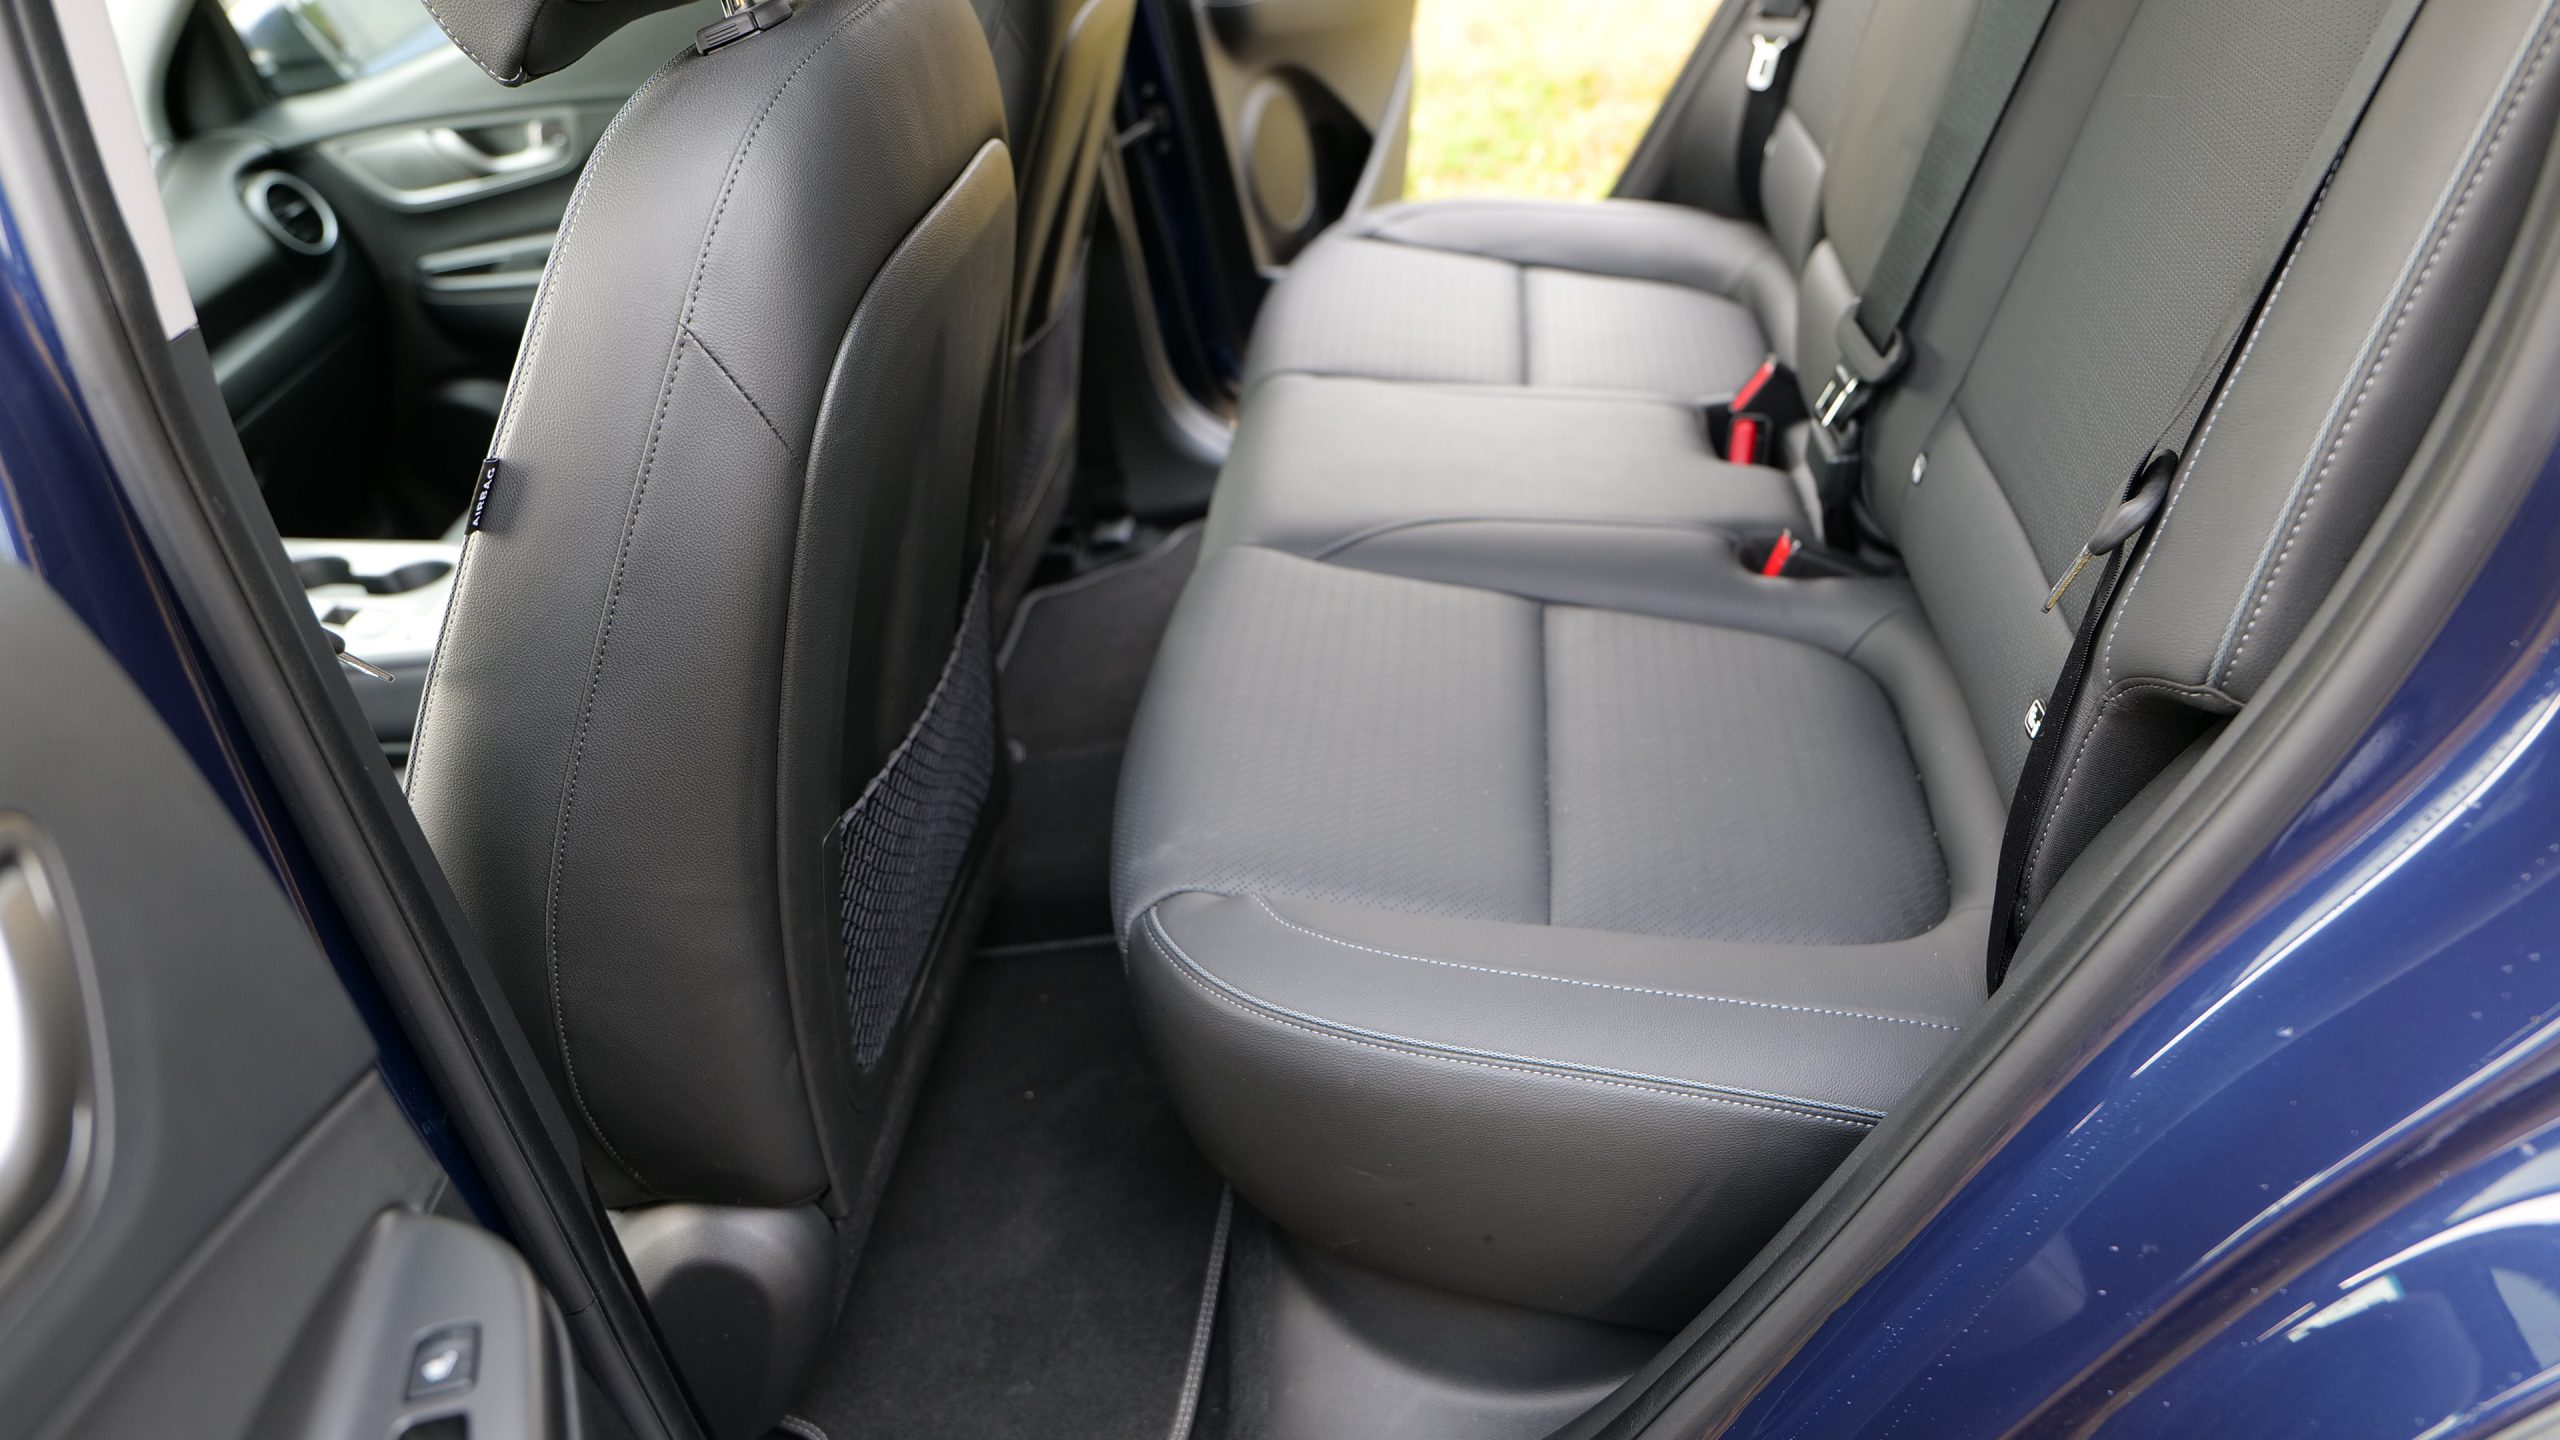 Hyundai Kona backseats